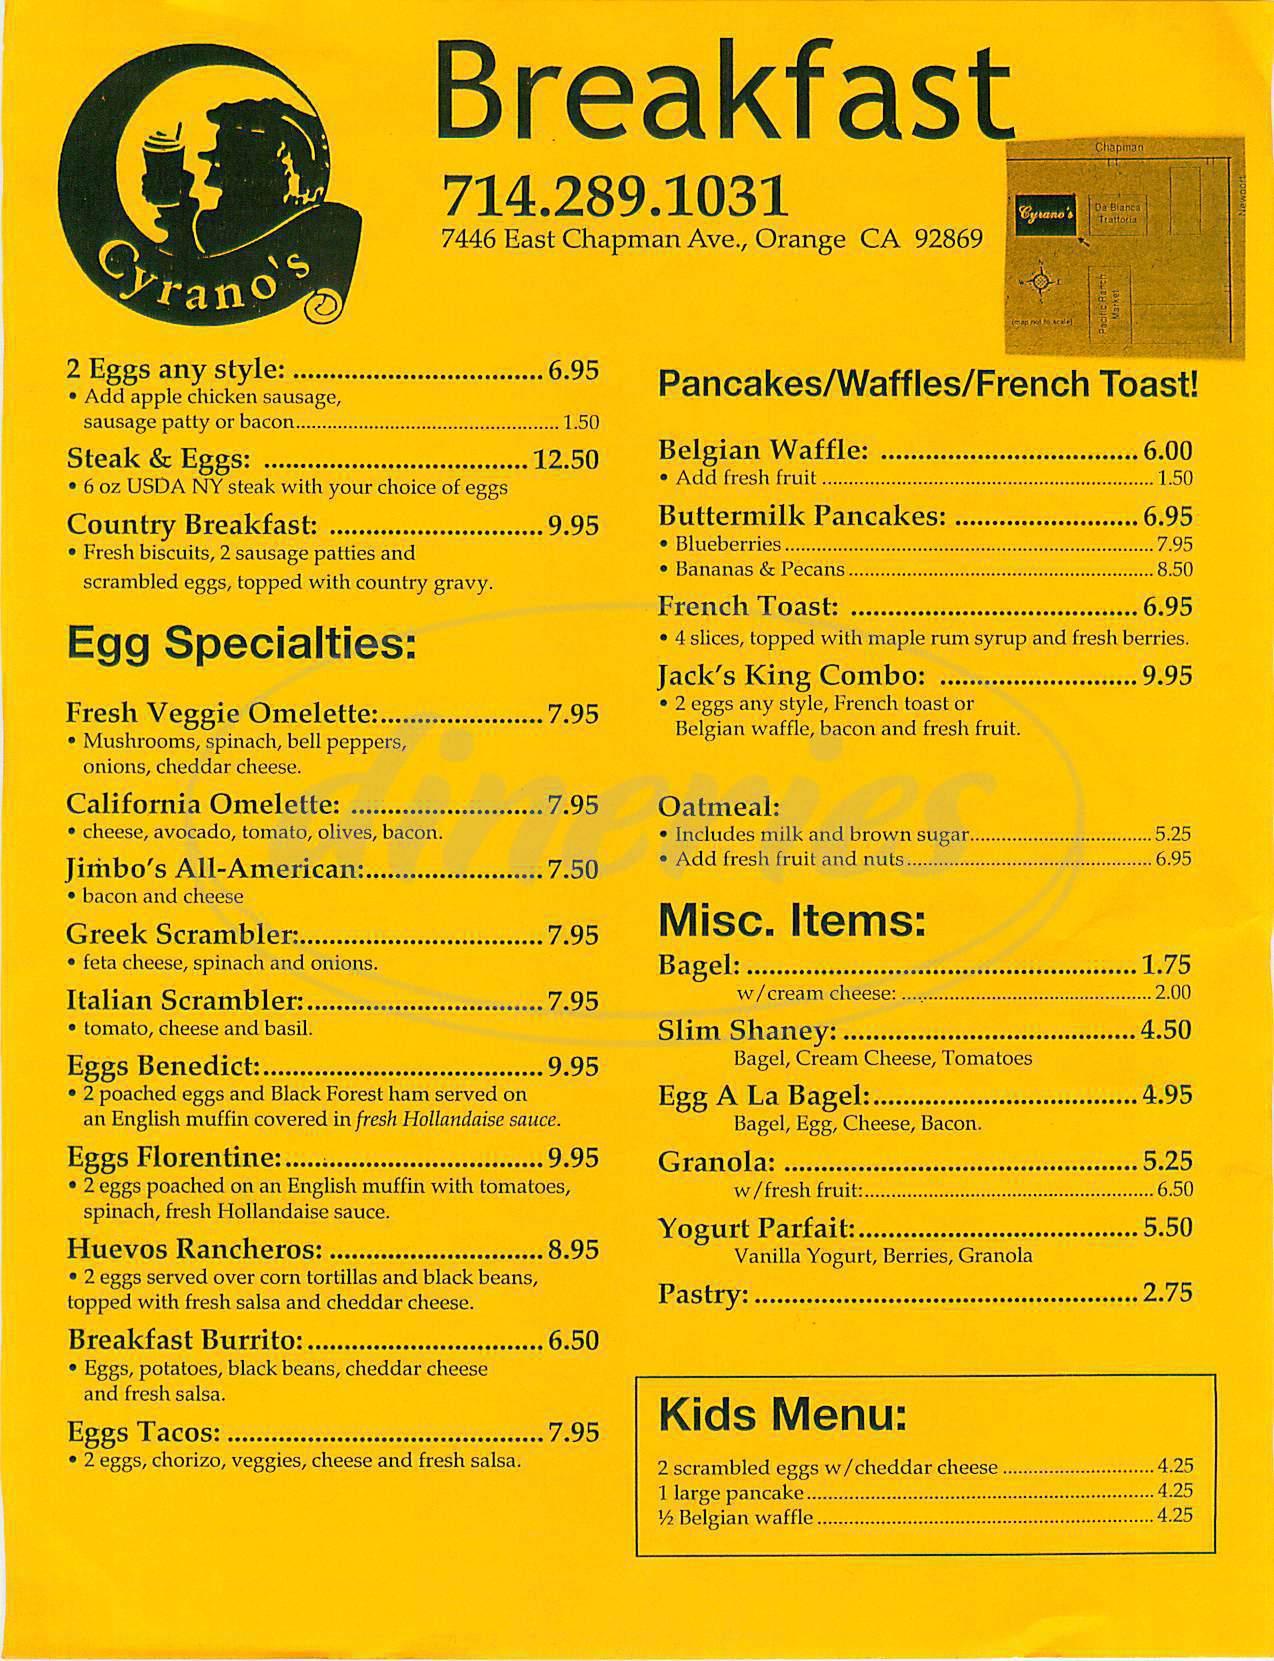 menu for Cyrano's